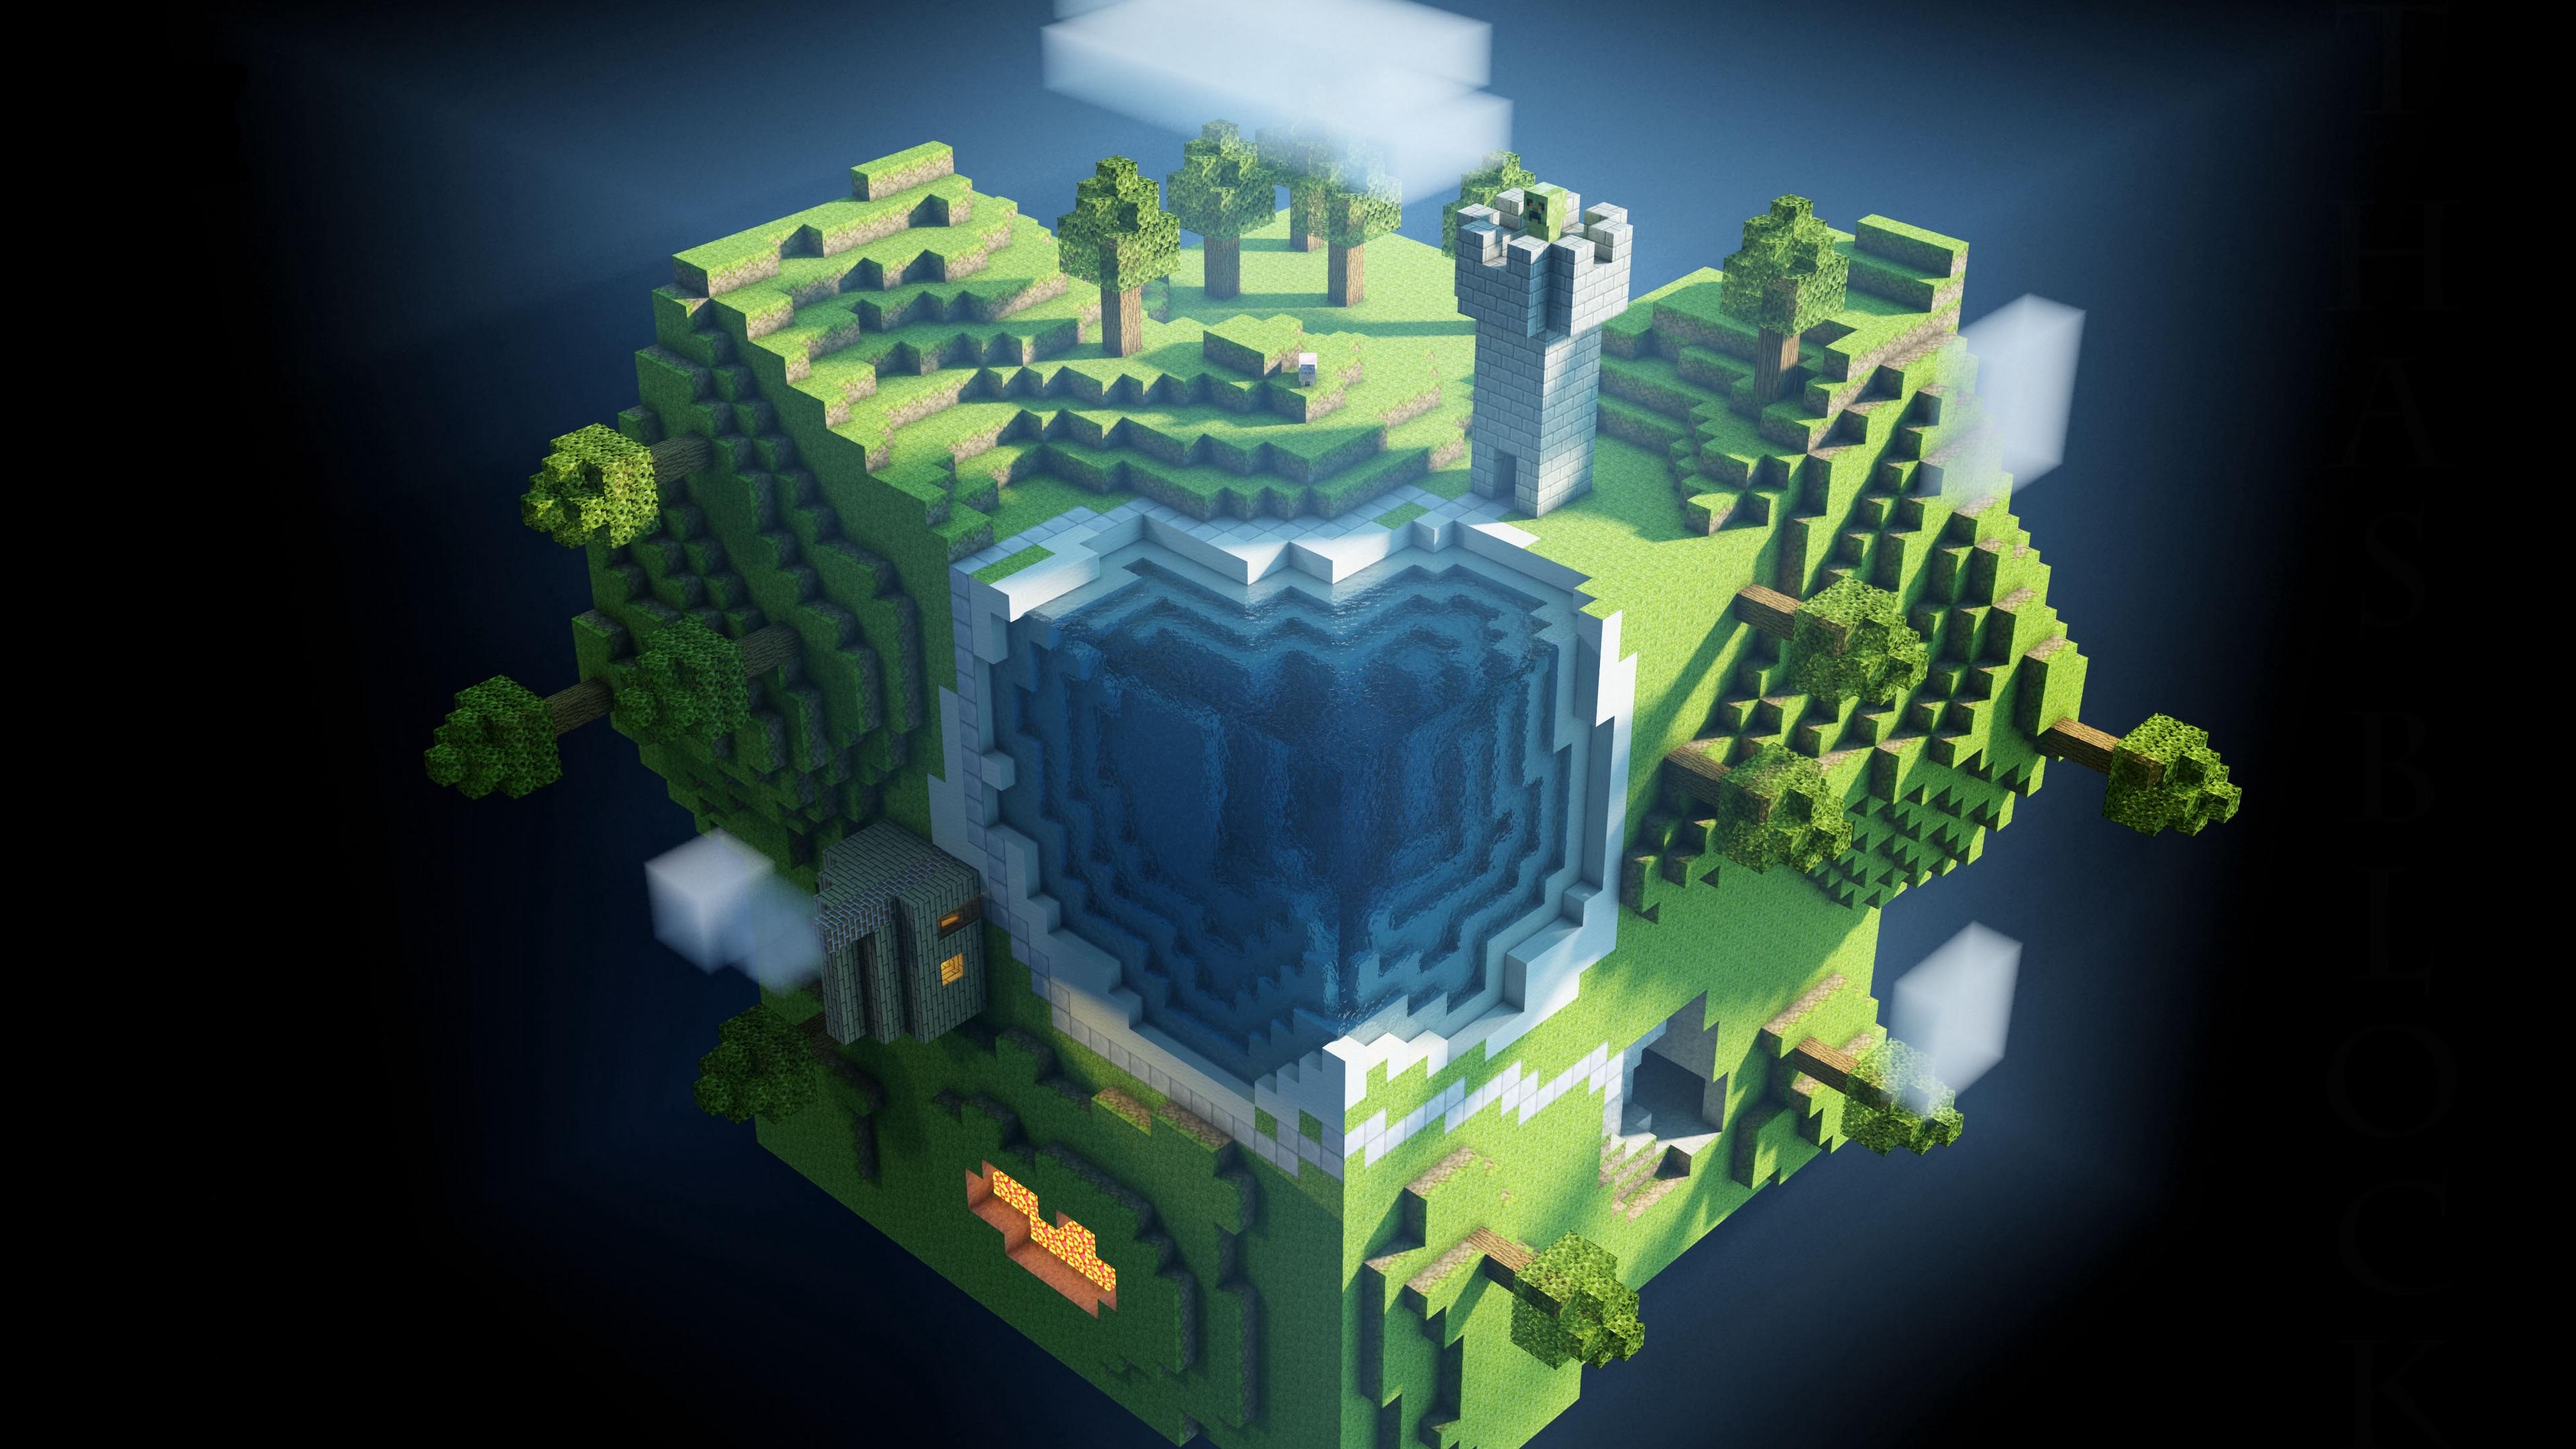 minecraft planet cube cubes world 4k 1538945022 - minecraft, planet, cube, cubes, world 4k - Planet, minecraft, Cube